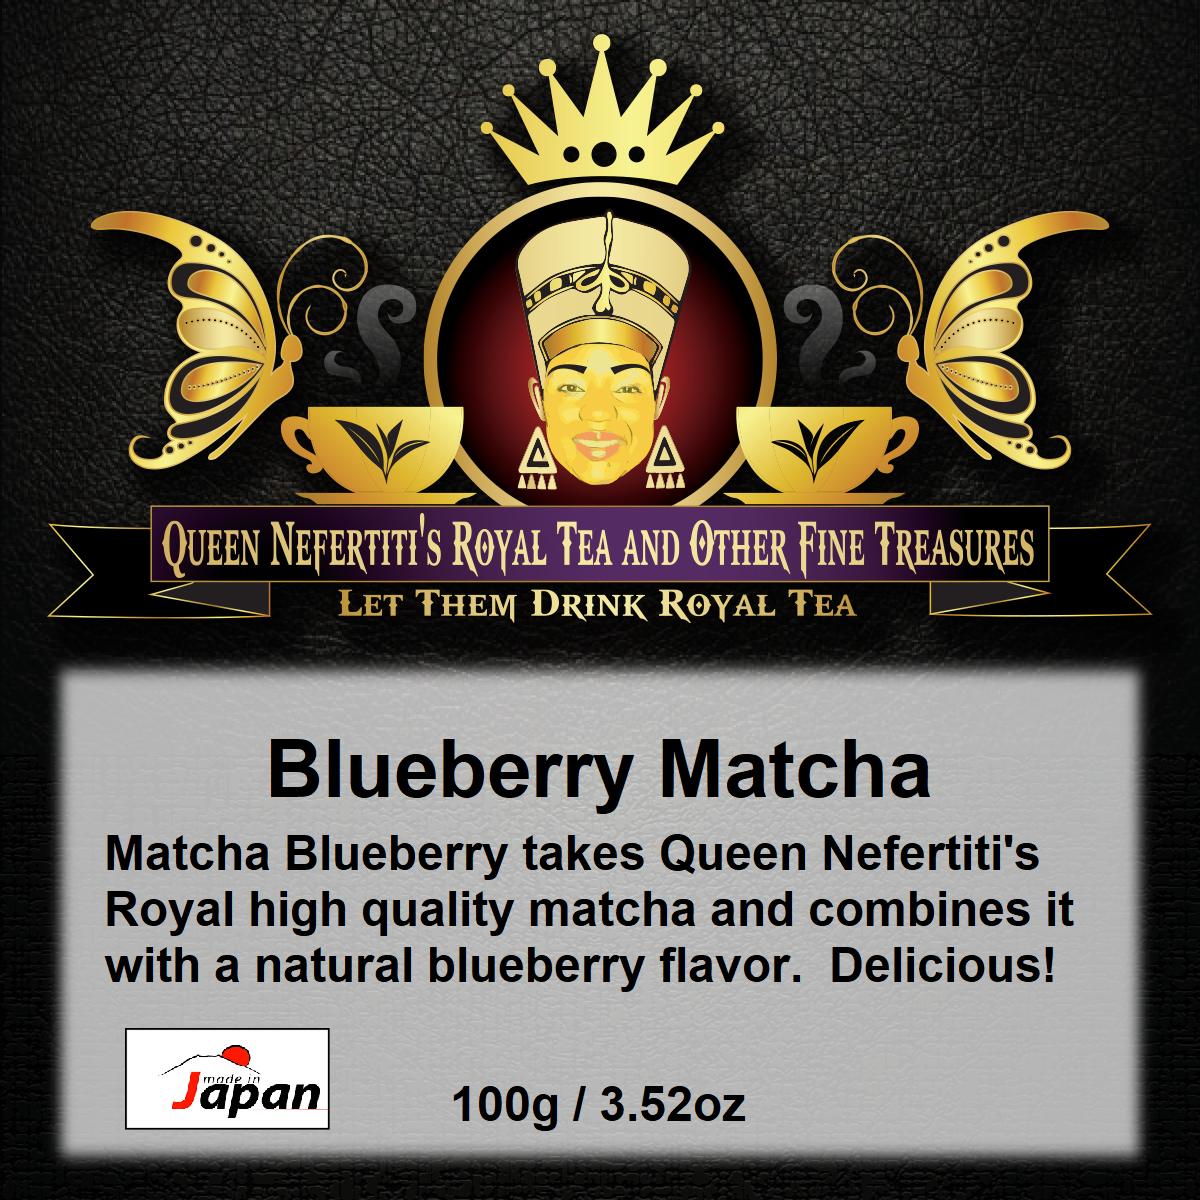 BLUEBERRY MATCHA 100G